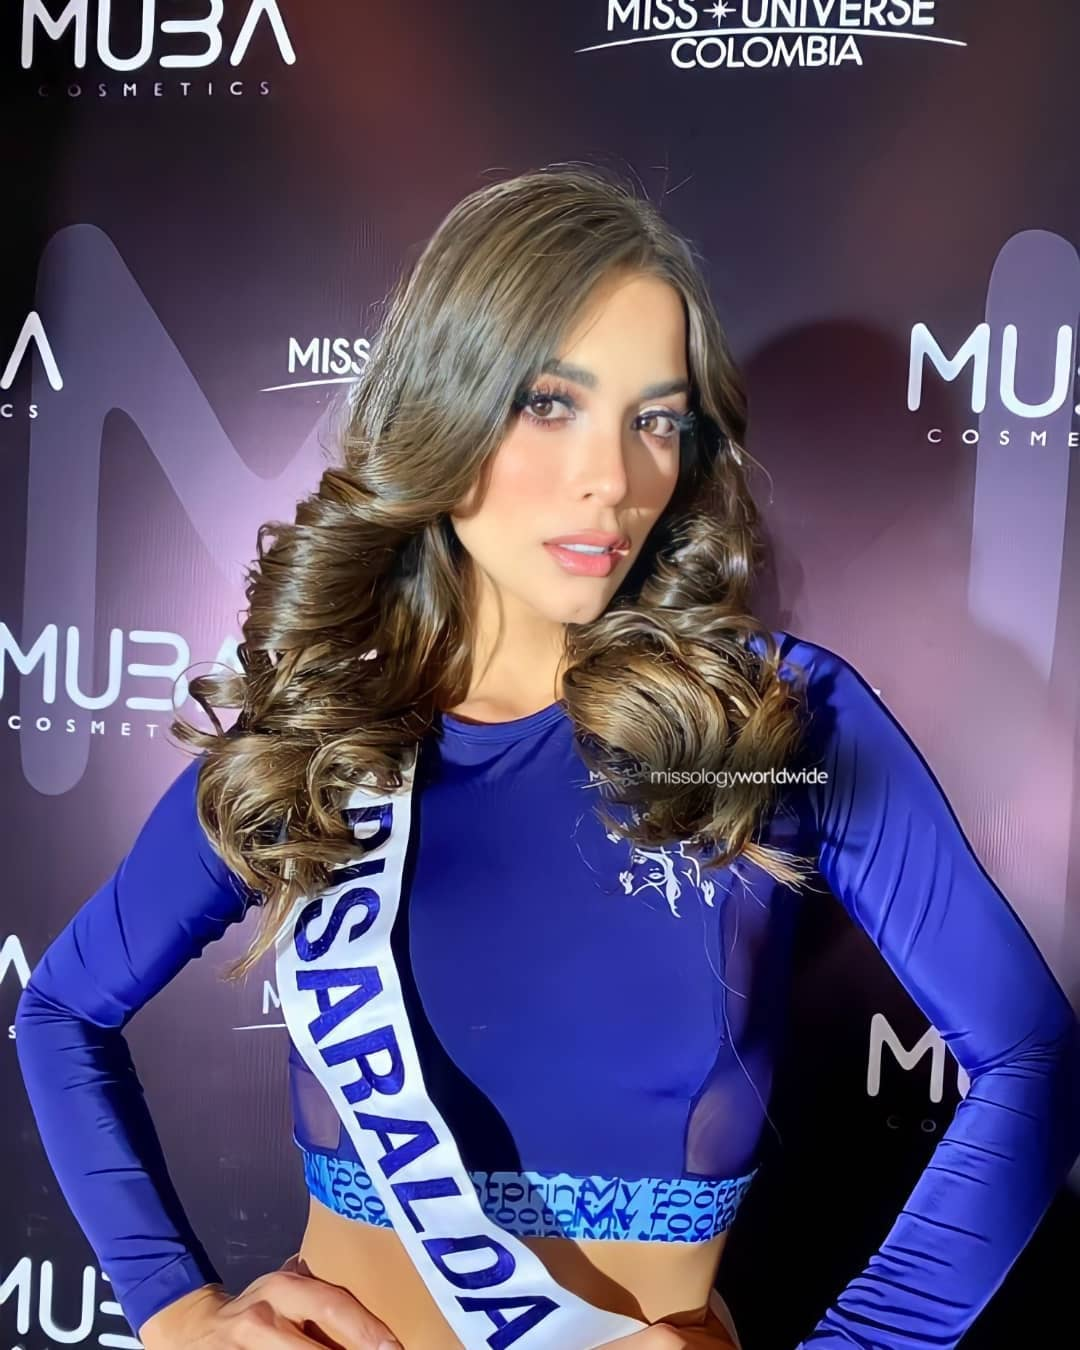 maria alejandra lopez perez, top 2 de miss universe colombia 2021/reyna hispanoamericana 2013/miss caraibes hibiscus 2014/miss colombia mundo 2015. - Página 5 24177612